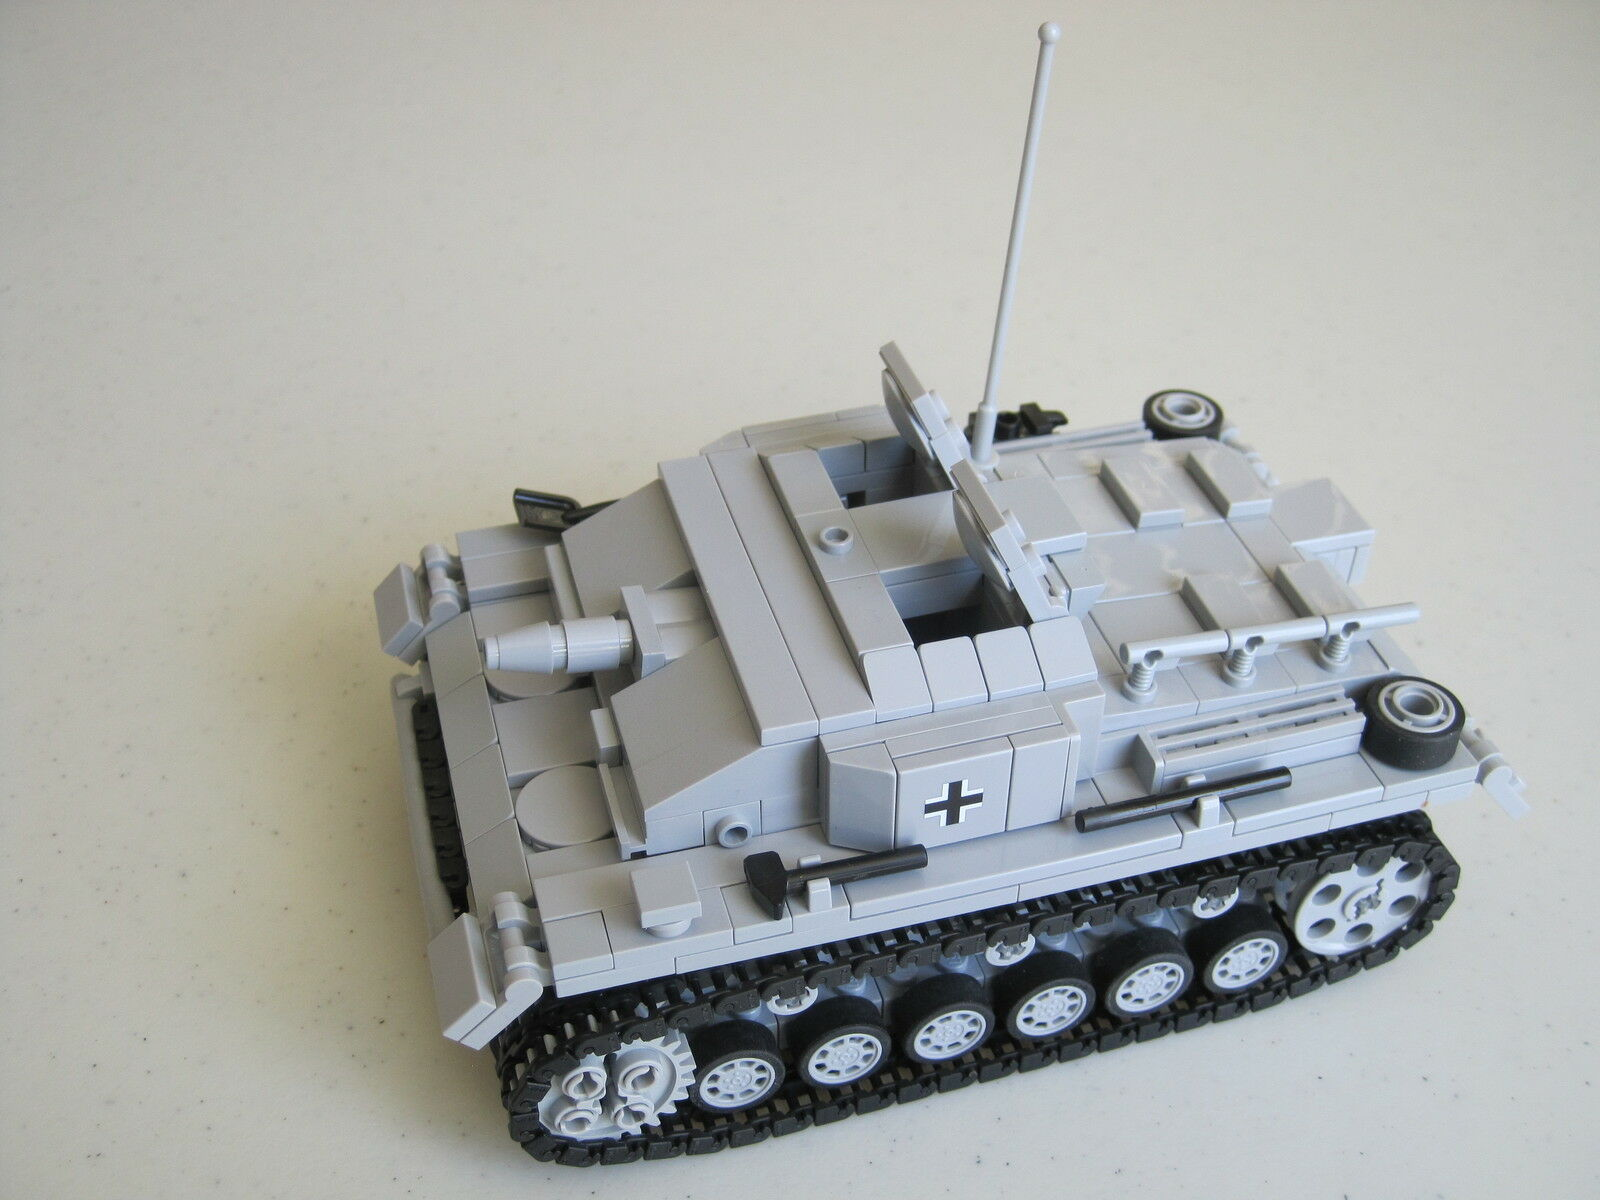 Lego WW2 GERMAN Vehicle StuG III Sd.Kfz 142 ausf. E Tank Artillery NEW